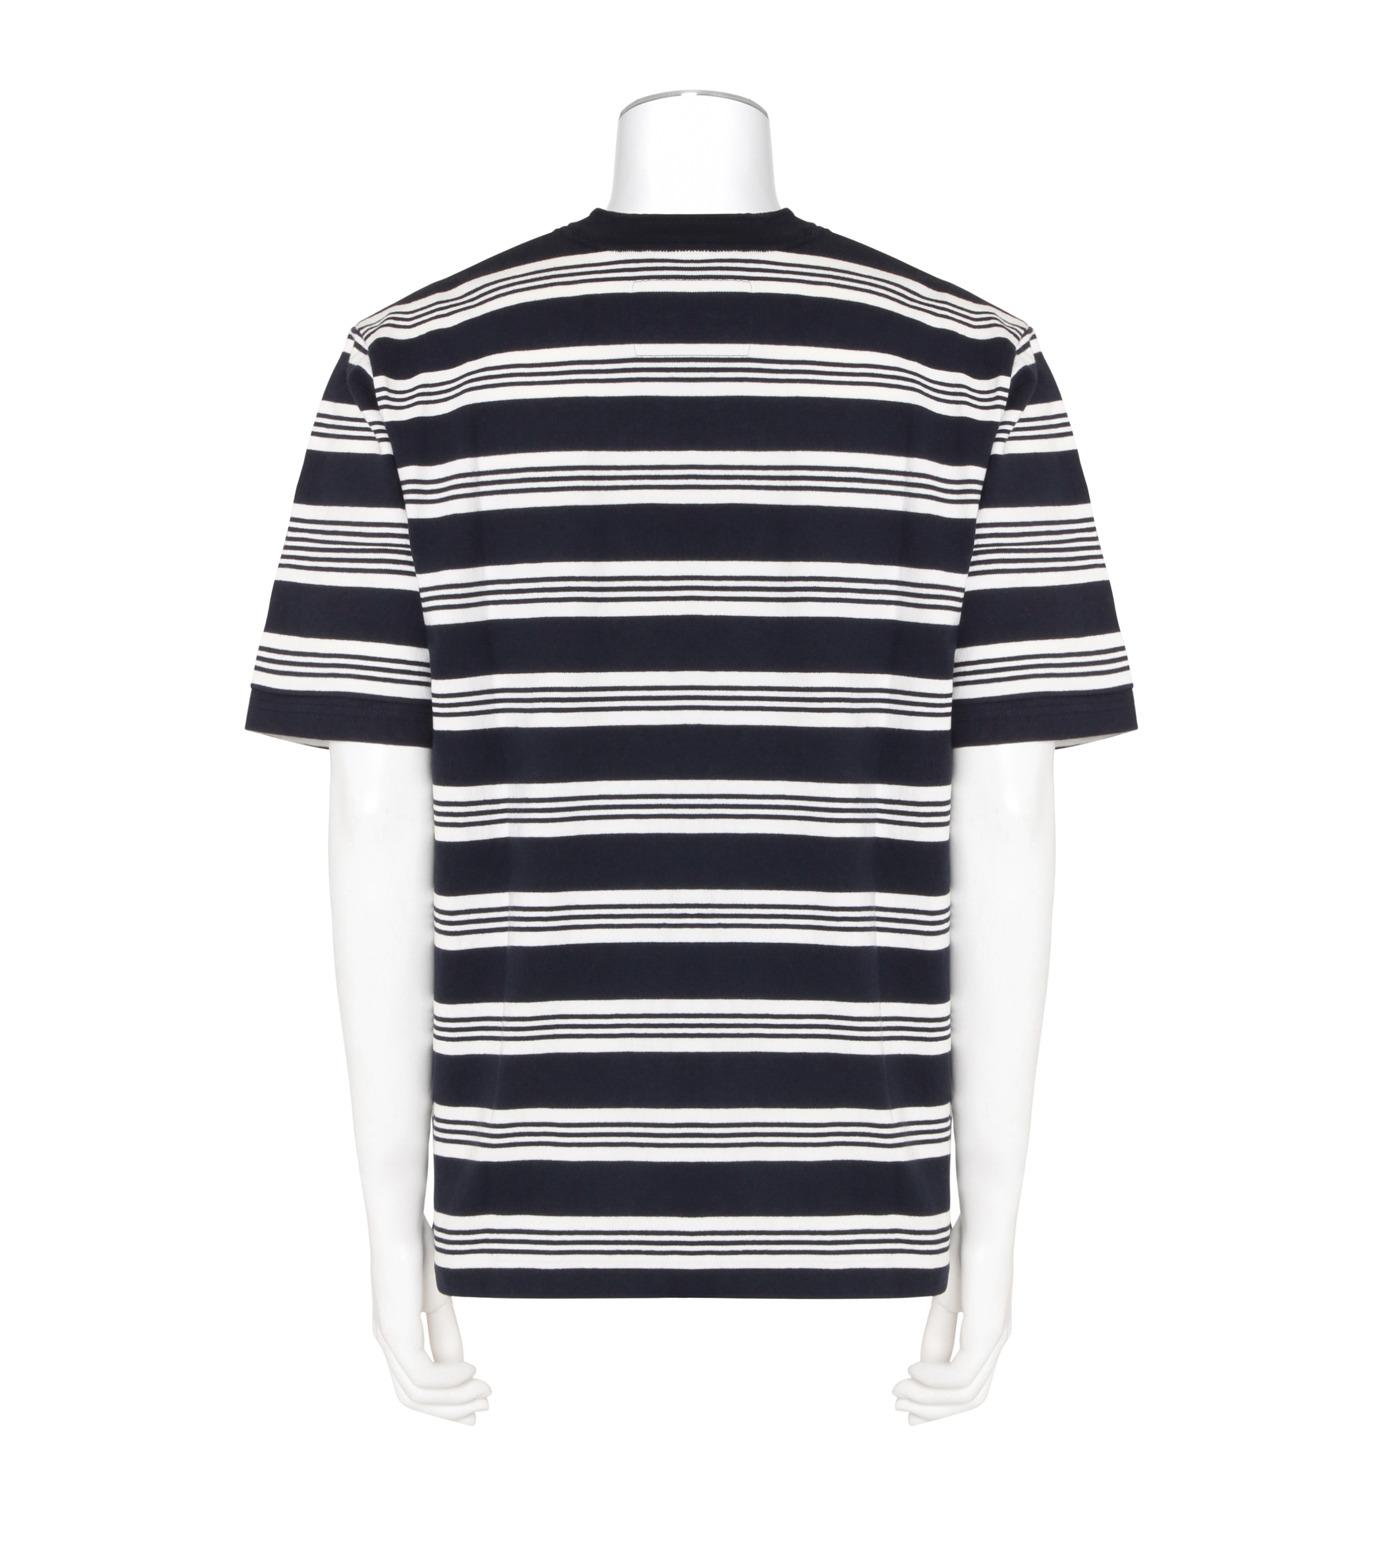 Sacai(サカイ)のBorder T-WHITE(カットソー/cut and sewn)-16-01174M-4 拡大詳細画像2